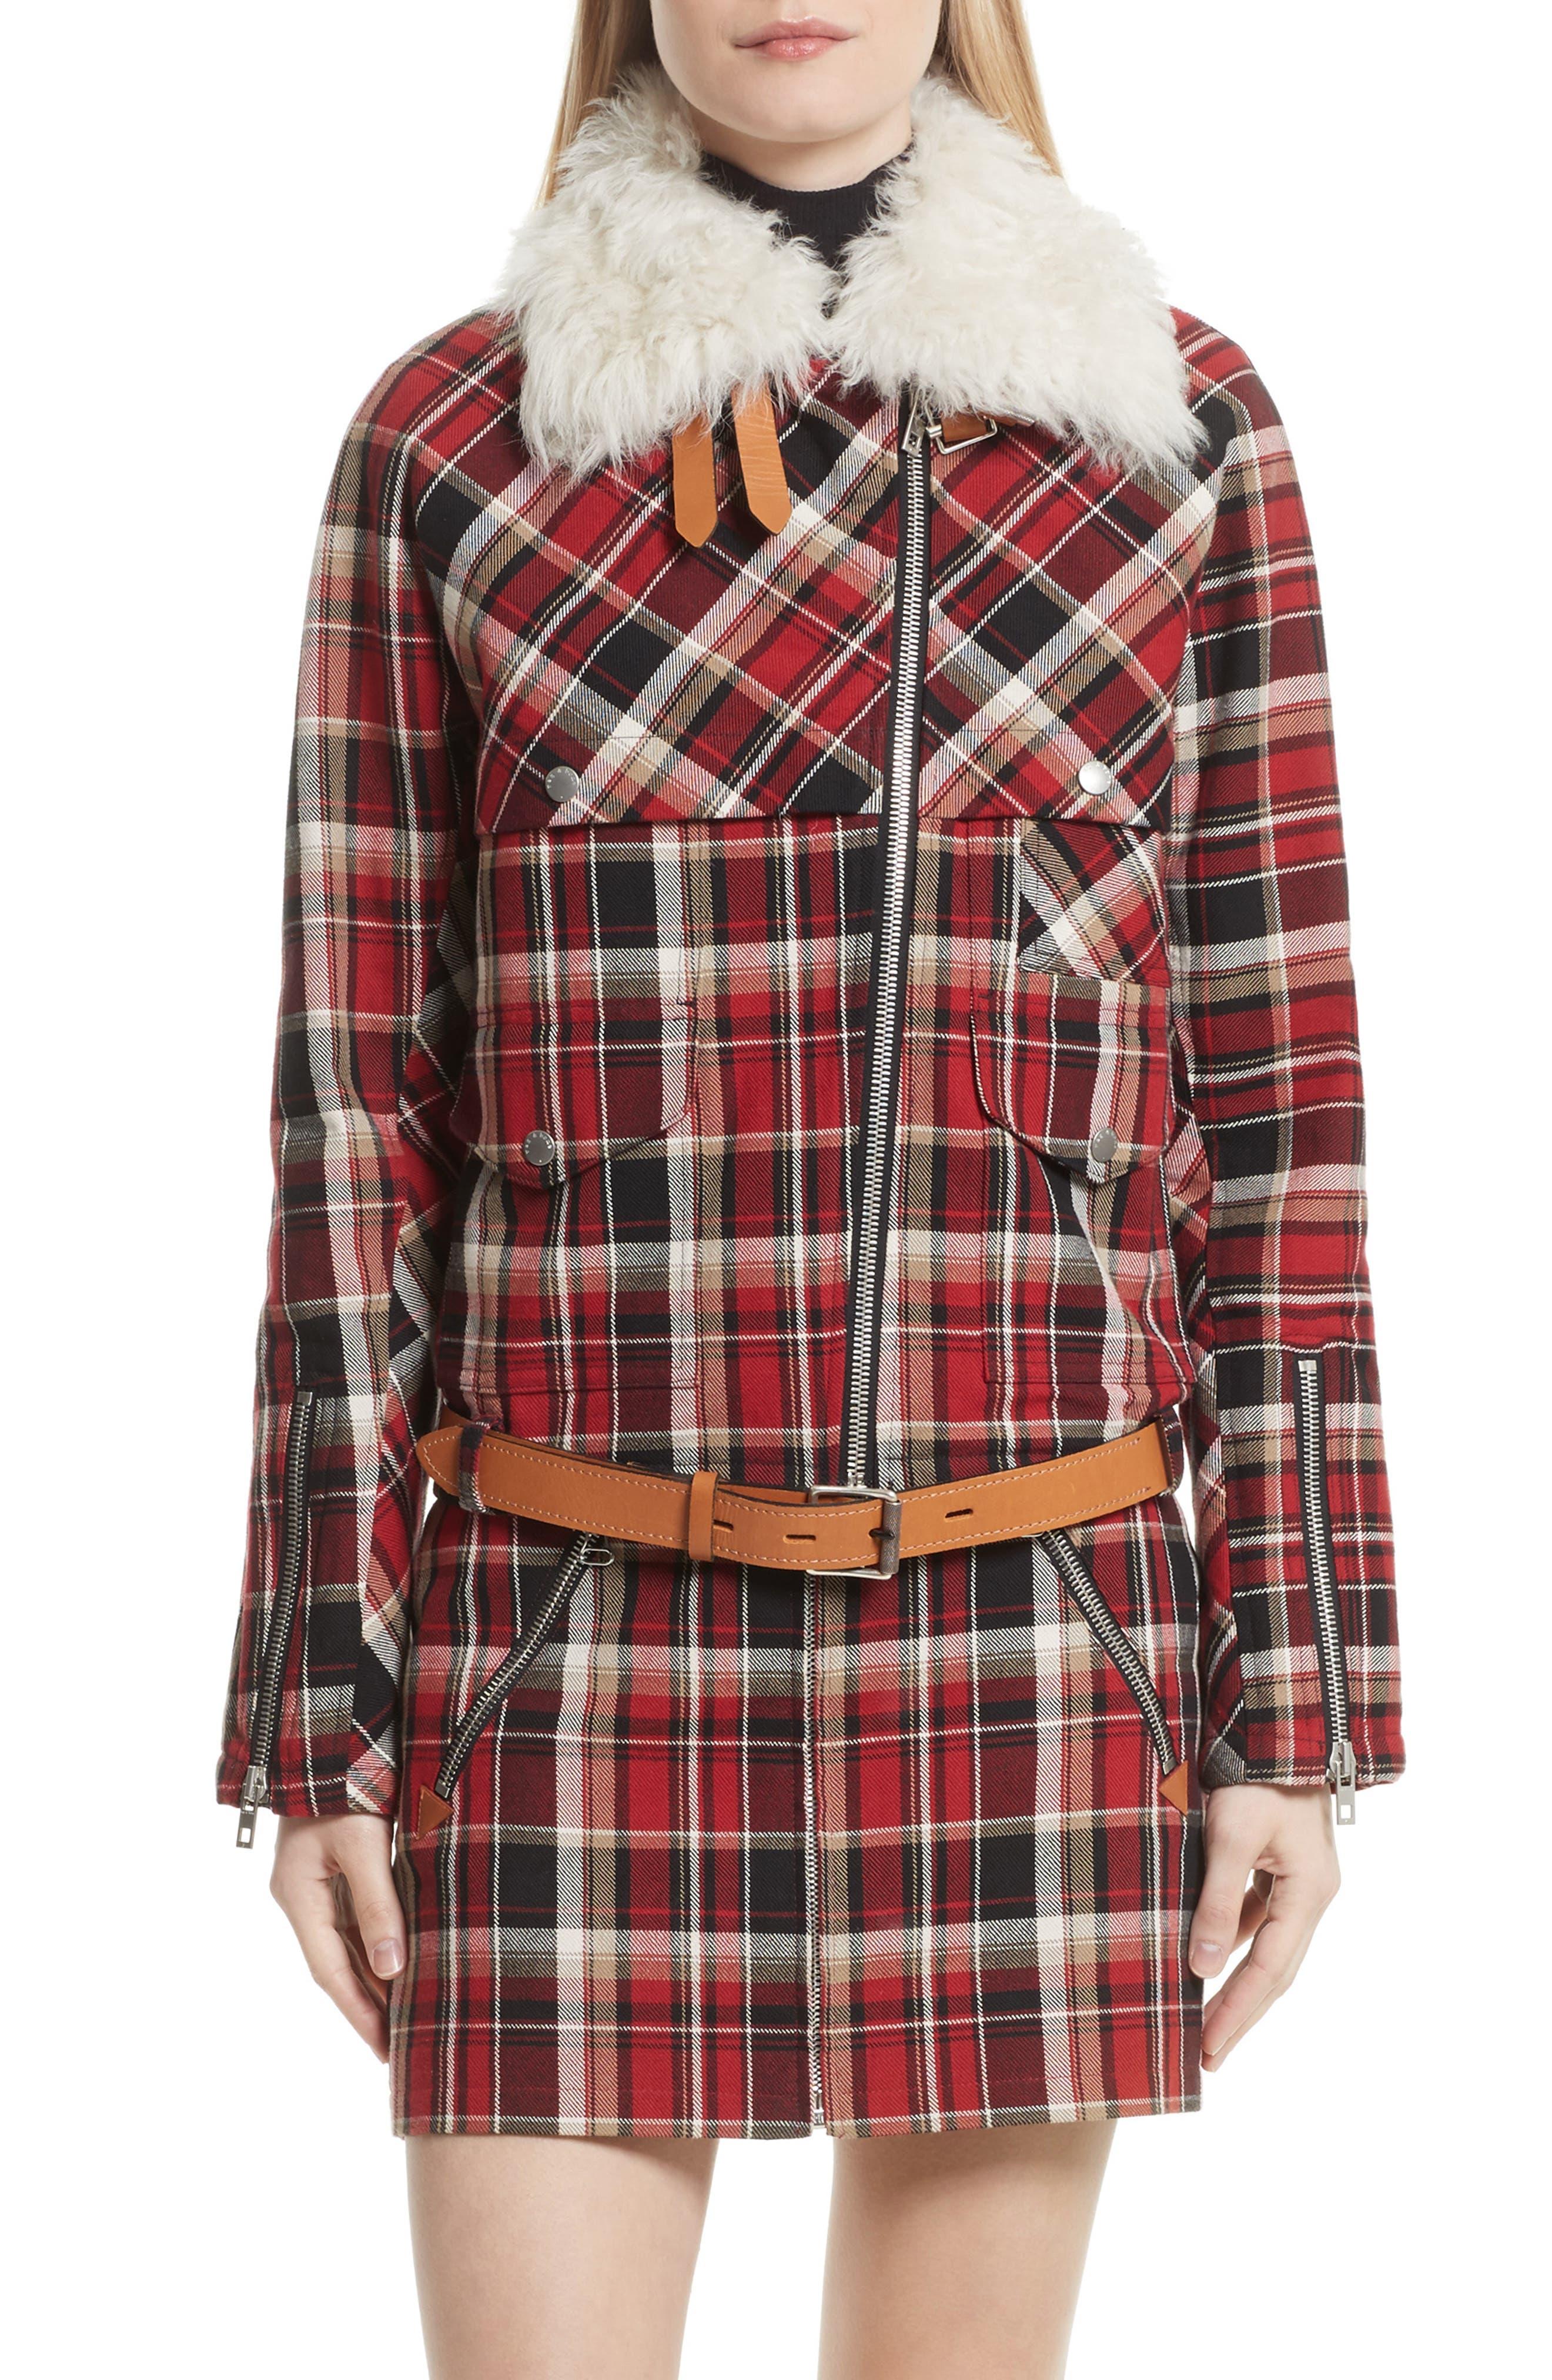 Alternate Image 1 Selected - rag & bone Etiene Plaid Jacket with Genuine Lamb Fur Collar